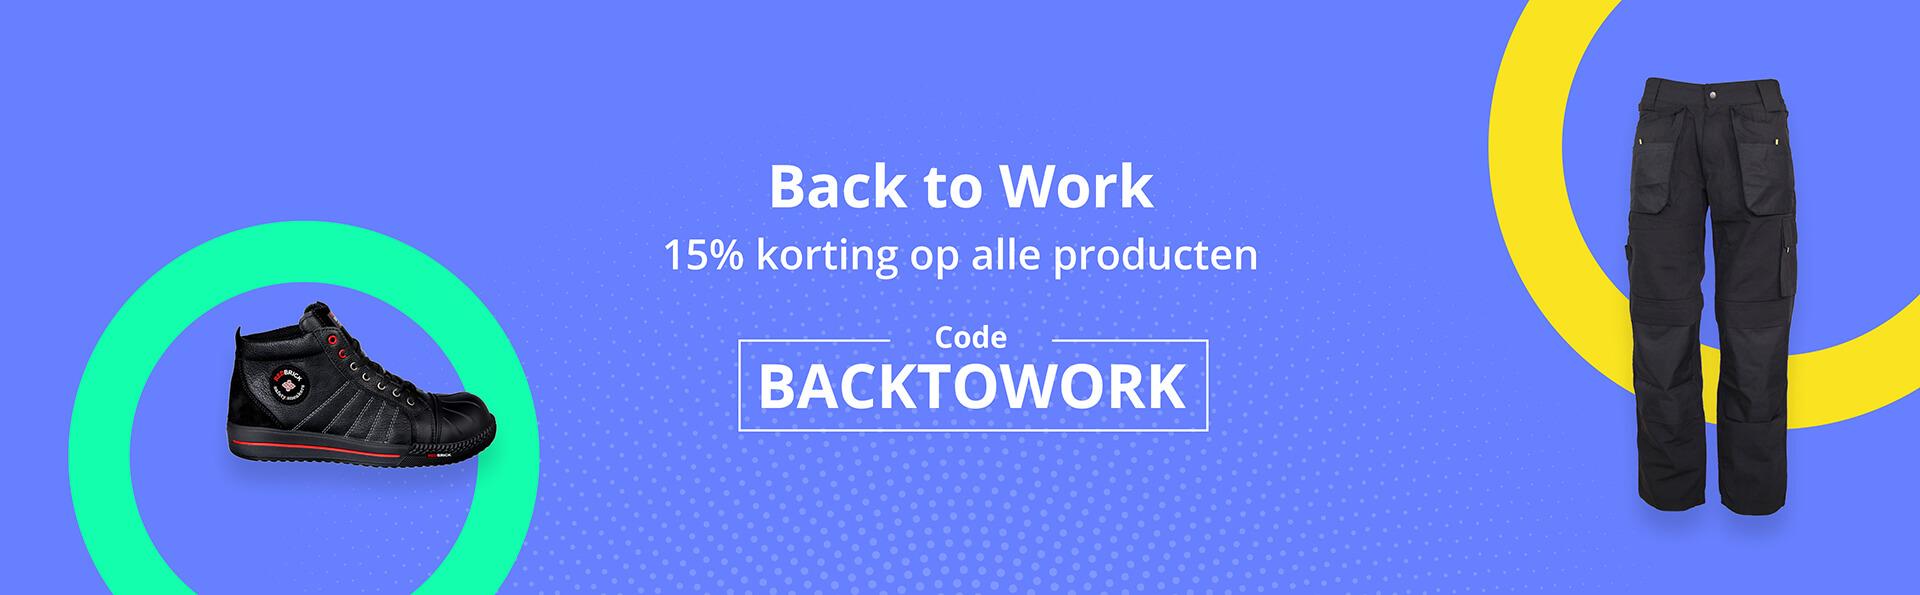 20190826 - Back to work 15% korting comp.